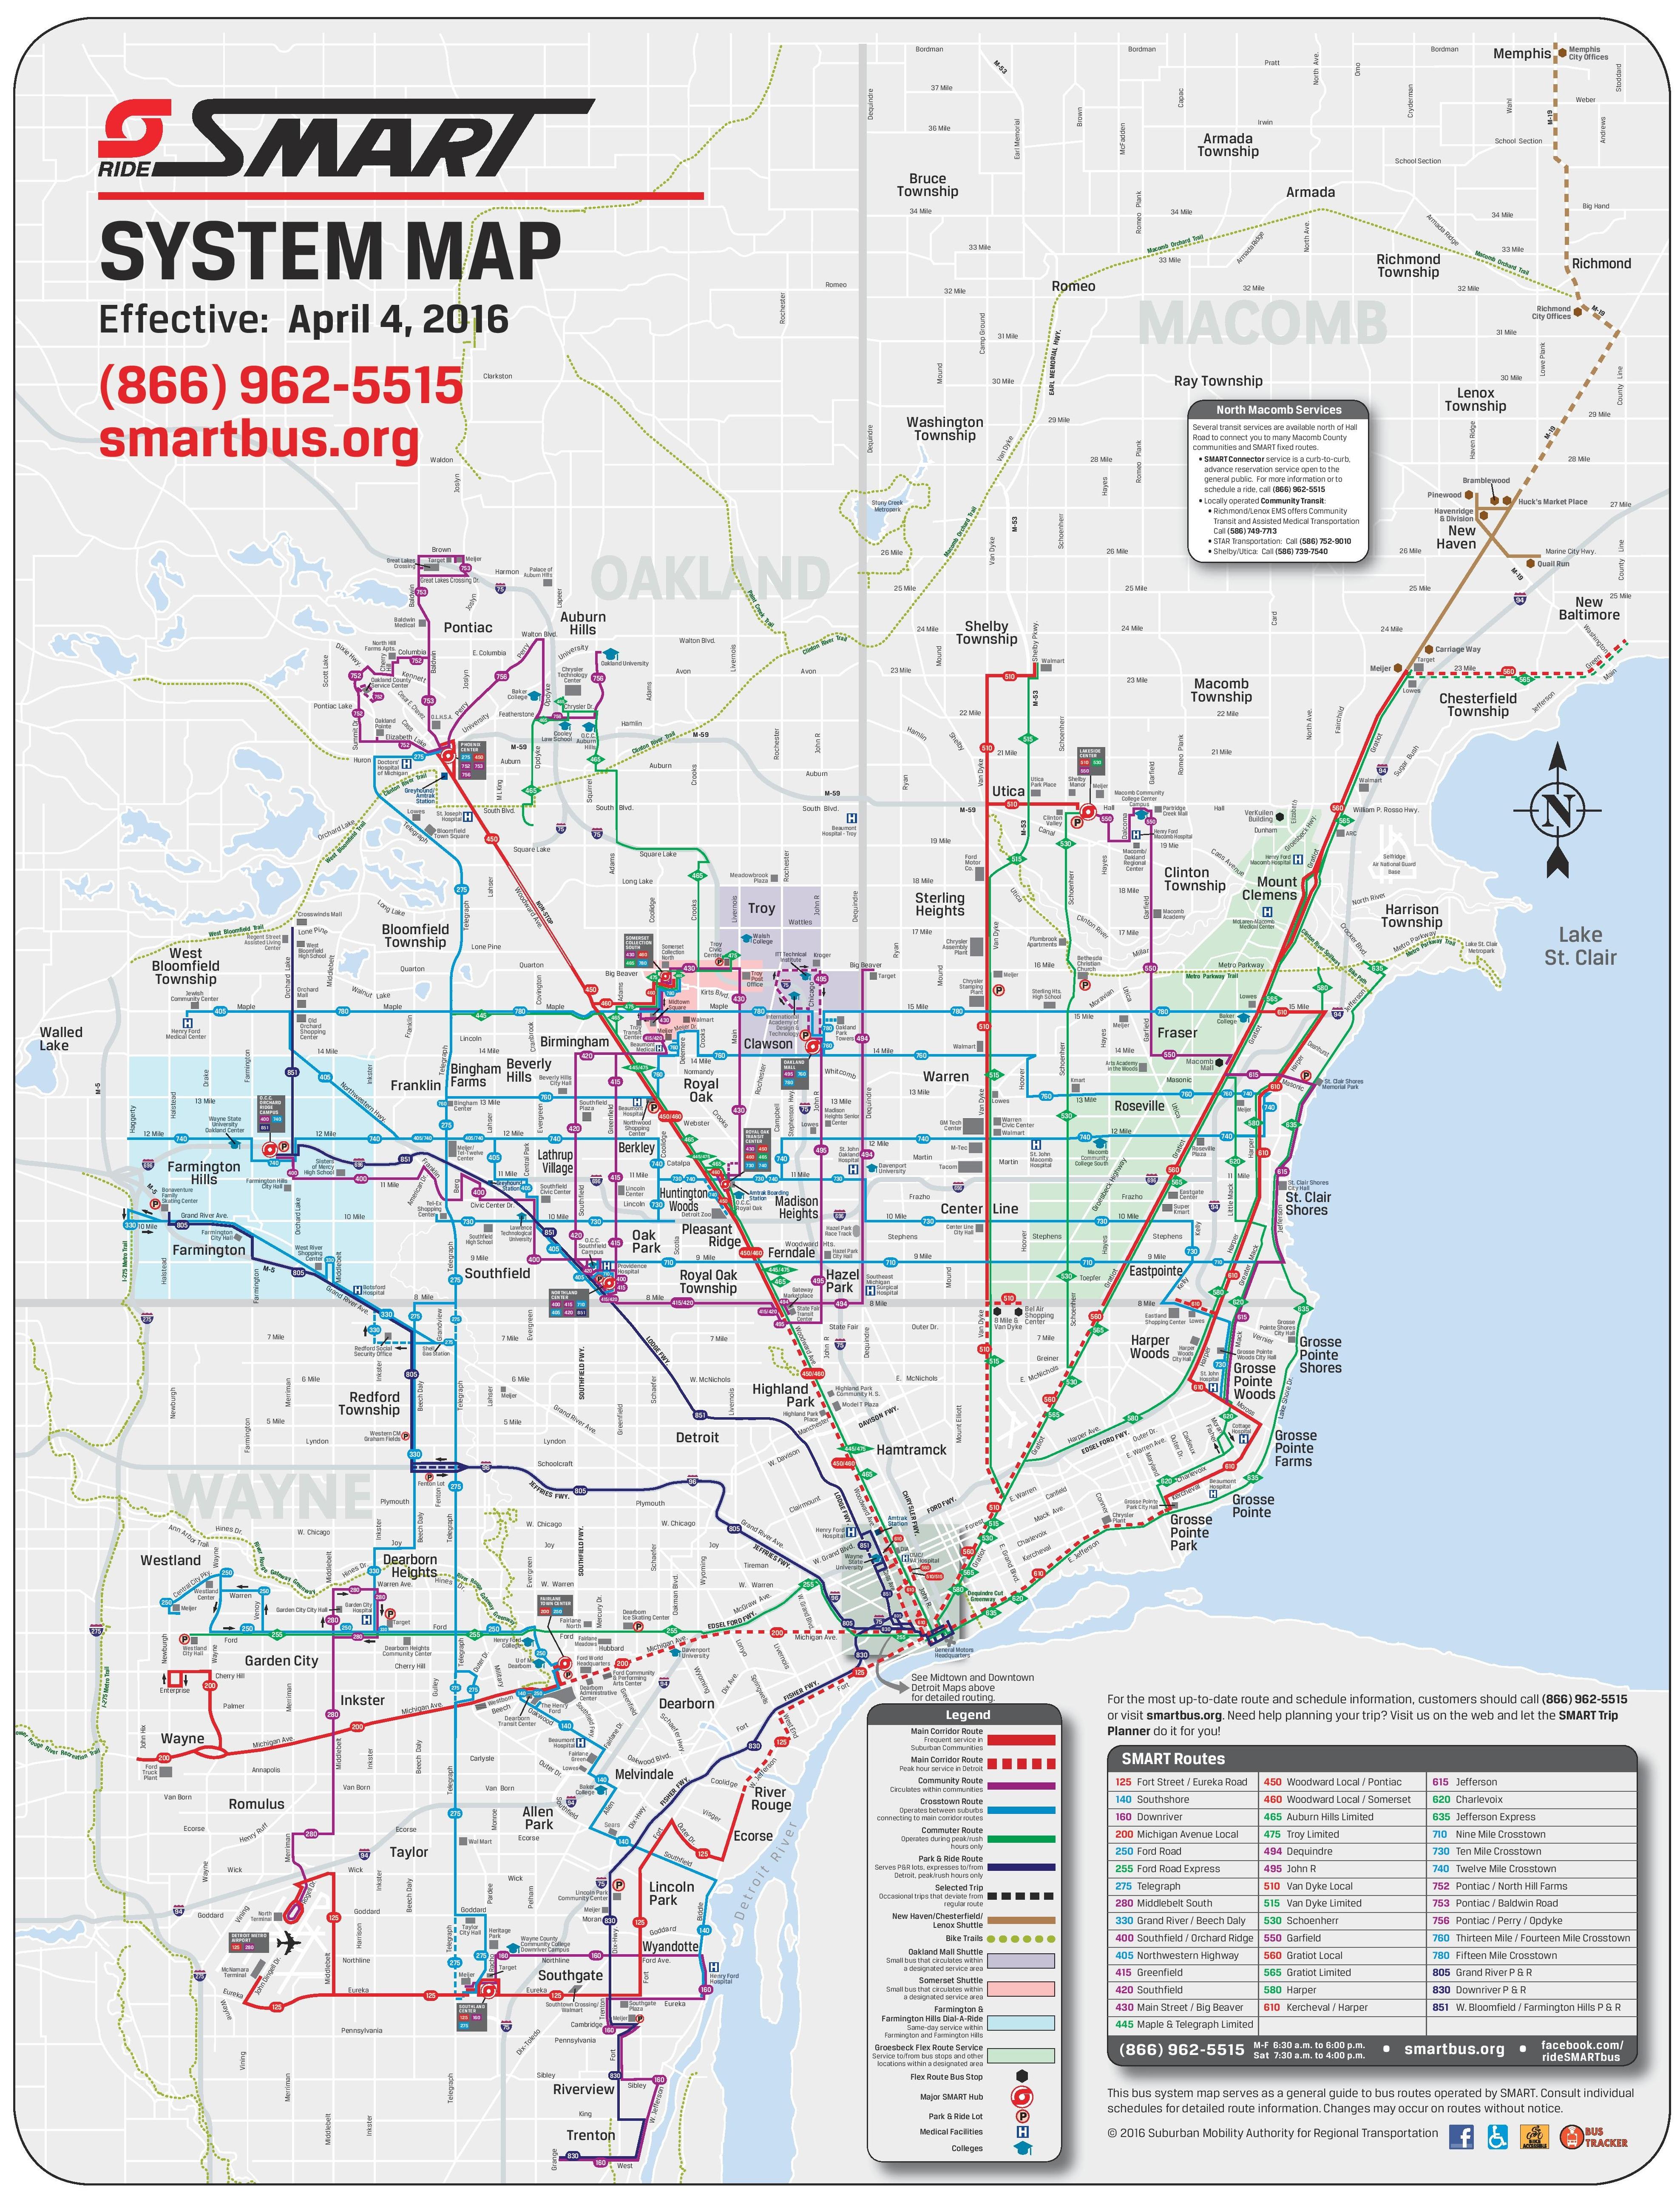 Detroit SMART map on